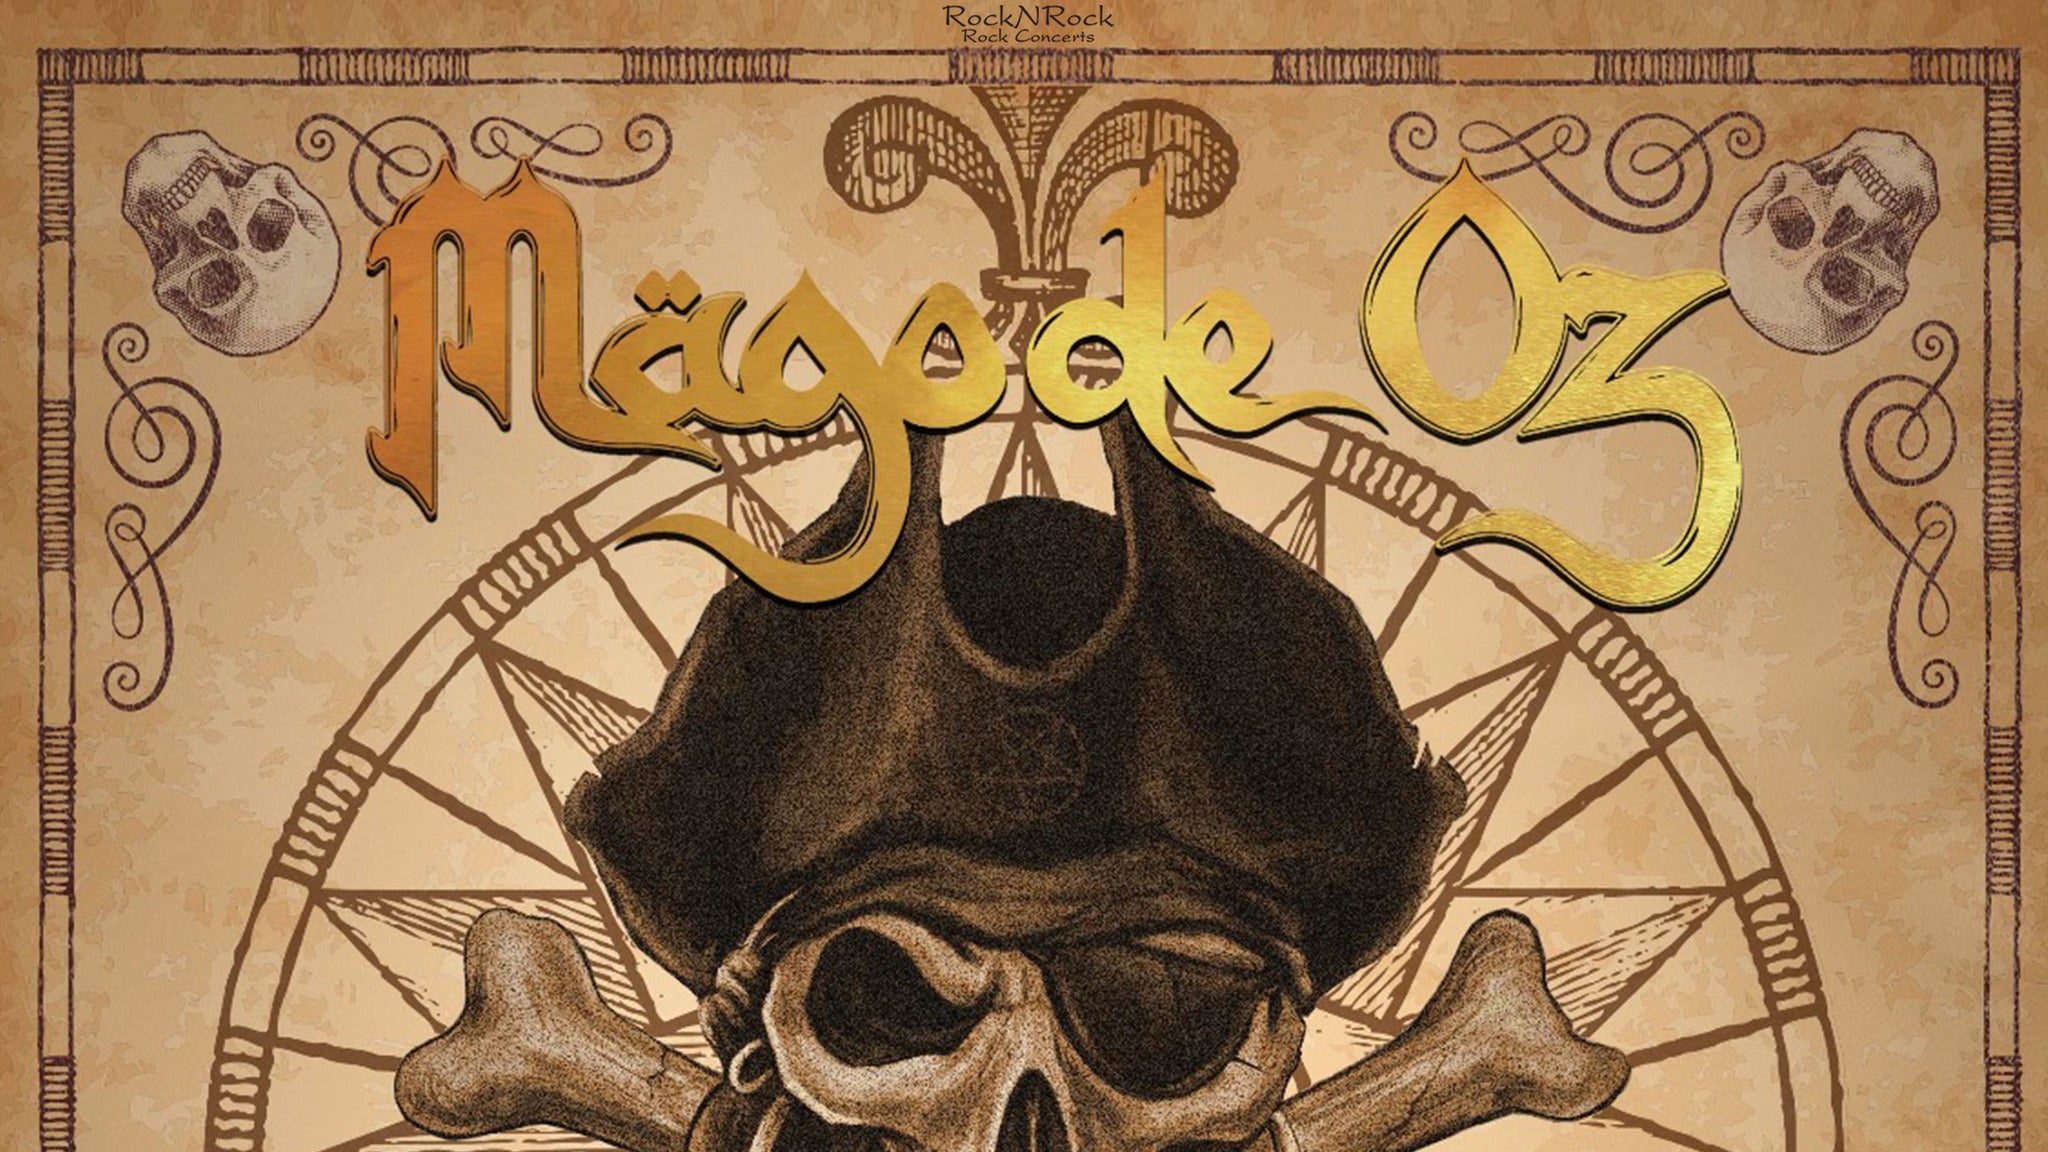 Mago De Oz ?? Al Abordaje!! Tour 2021 at The Van Buren